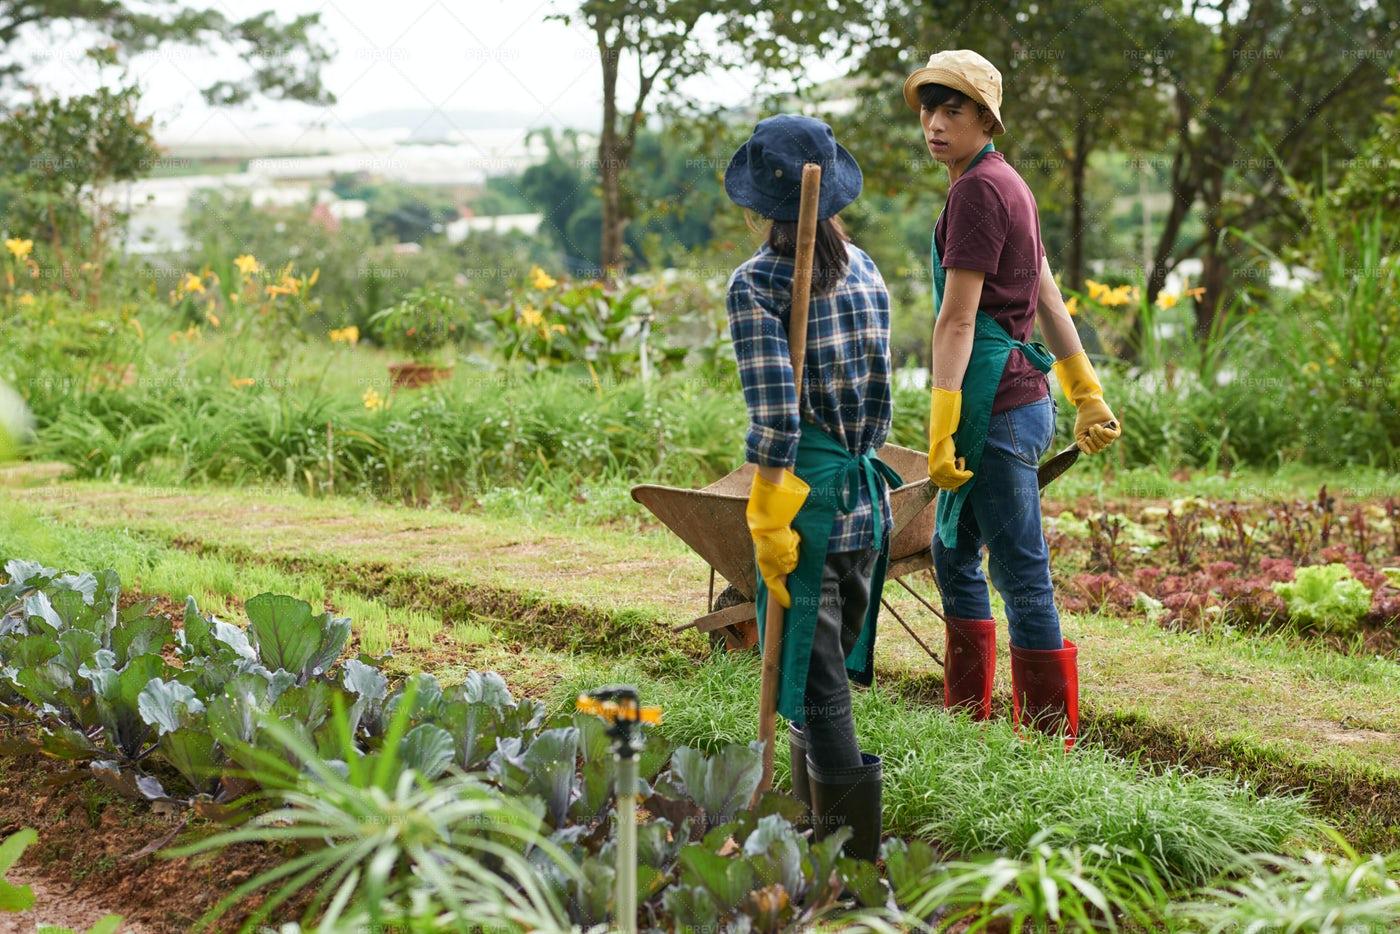 Gardening Couple: Stock Photos